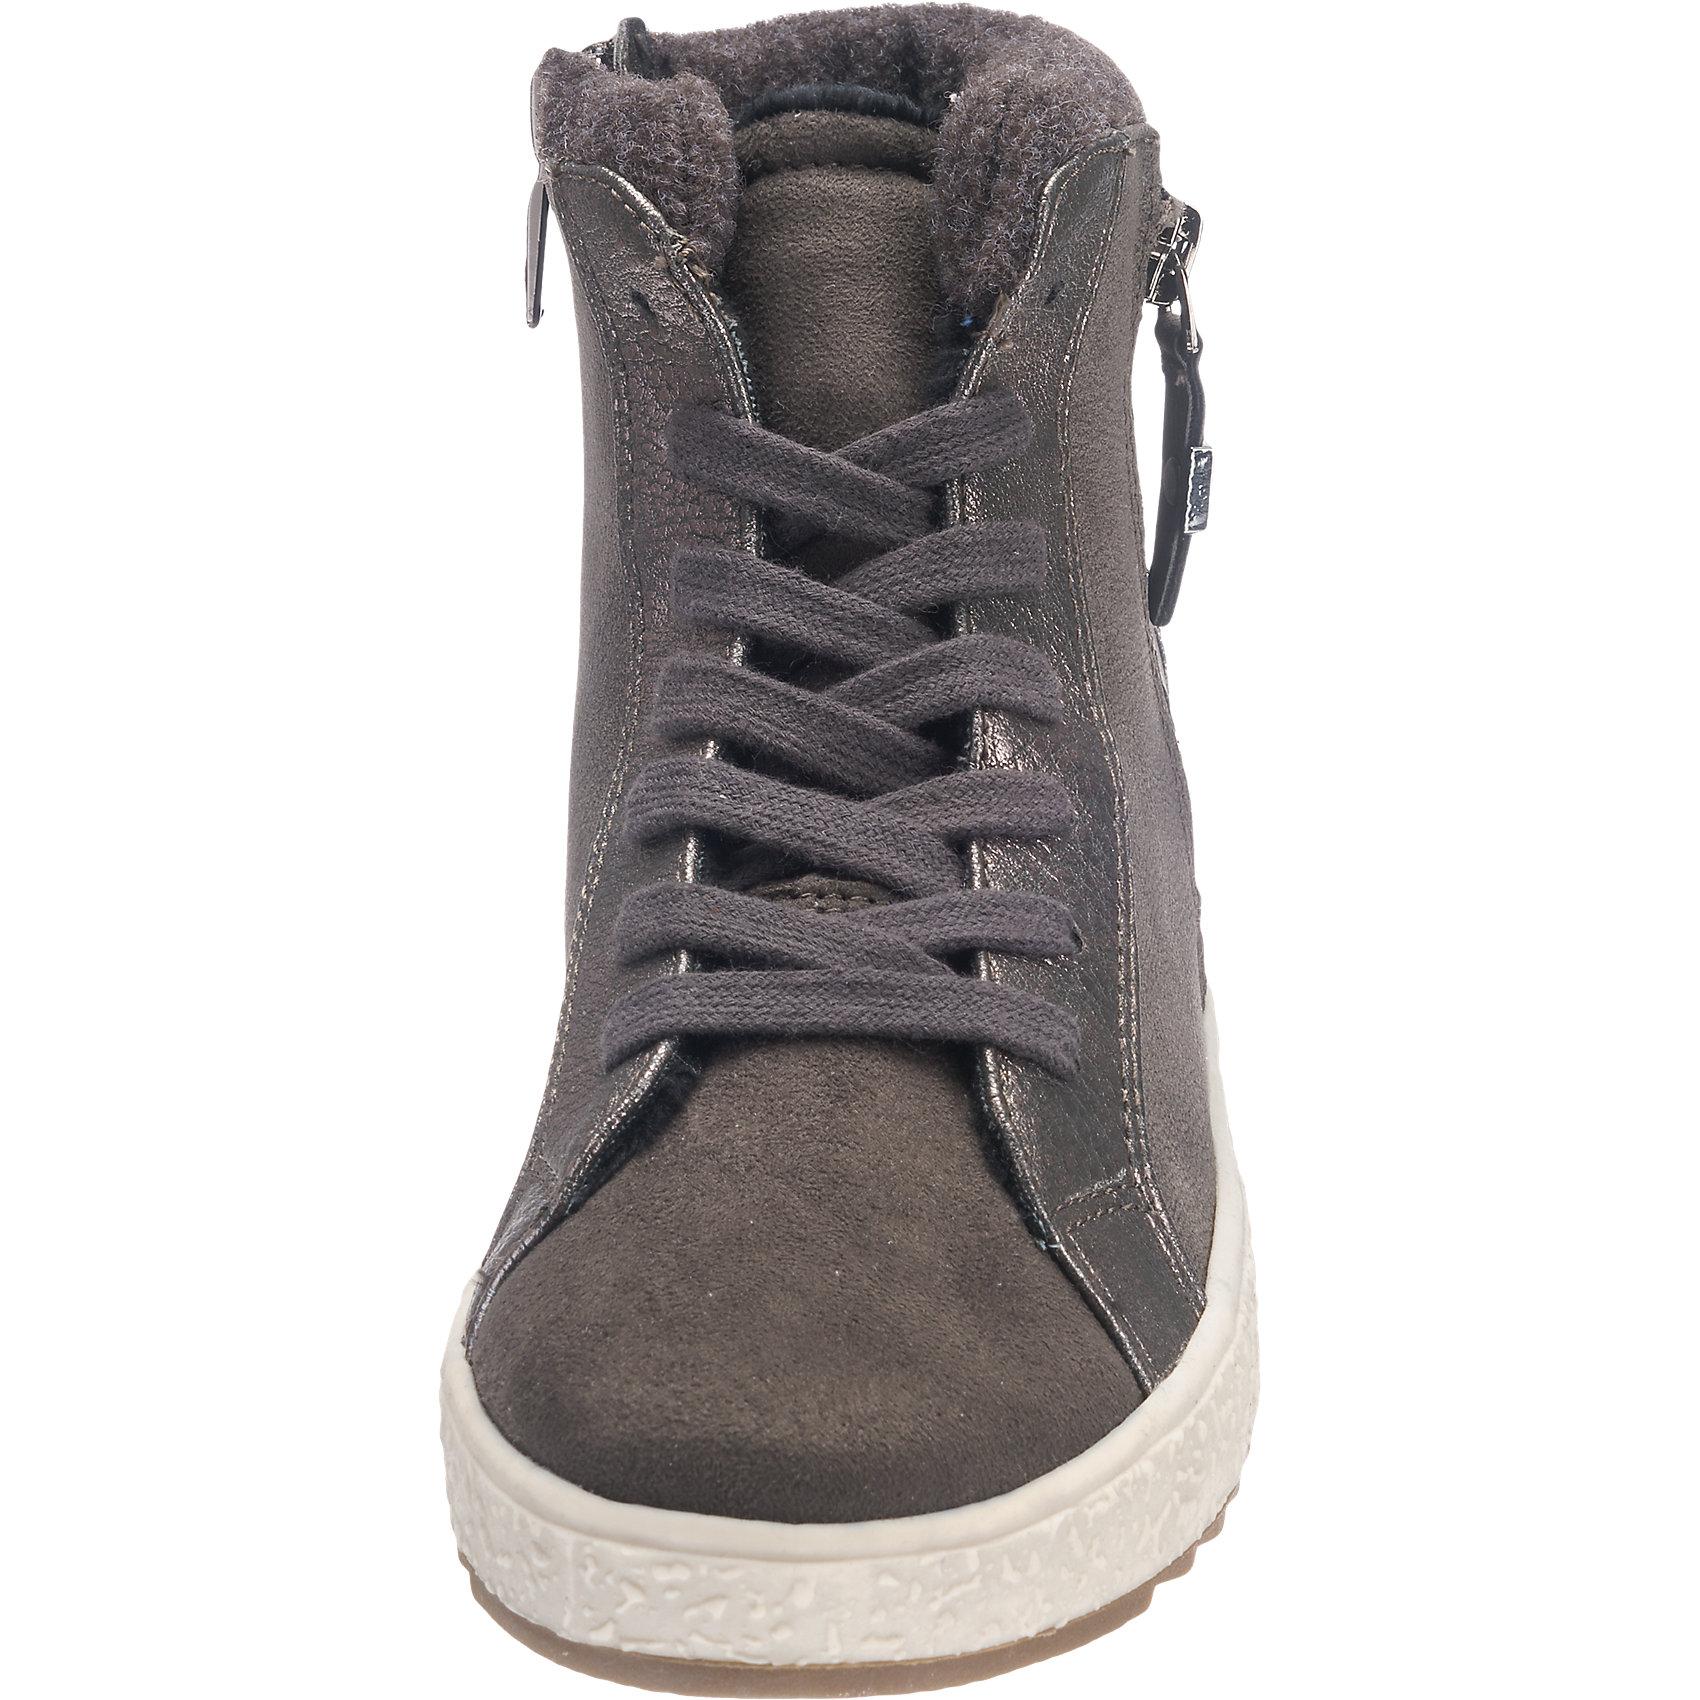 neu tom tailor sneakers 6862991 f r damen grau ebay. Black Bedroom Furniture Sets. Home Design Ideas